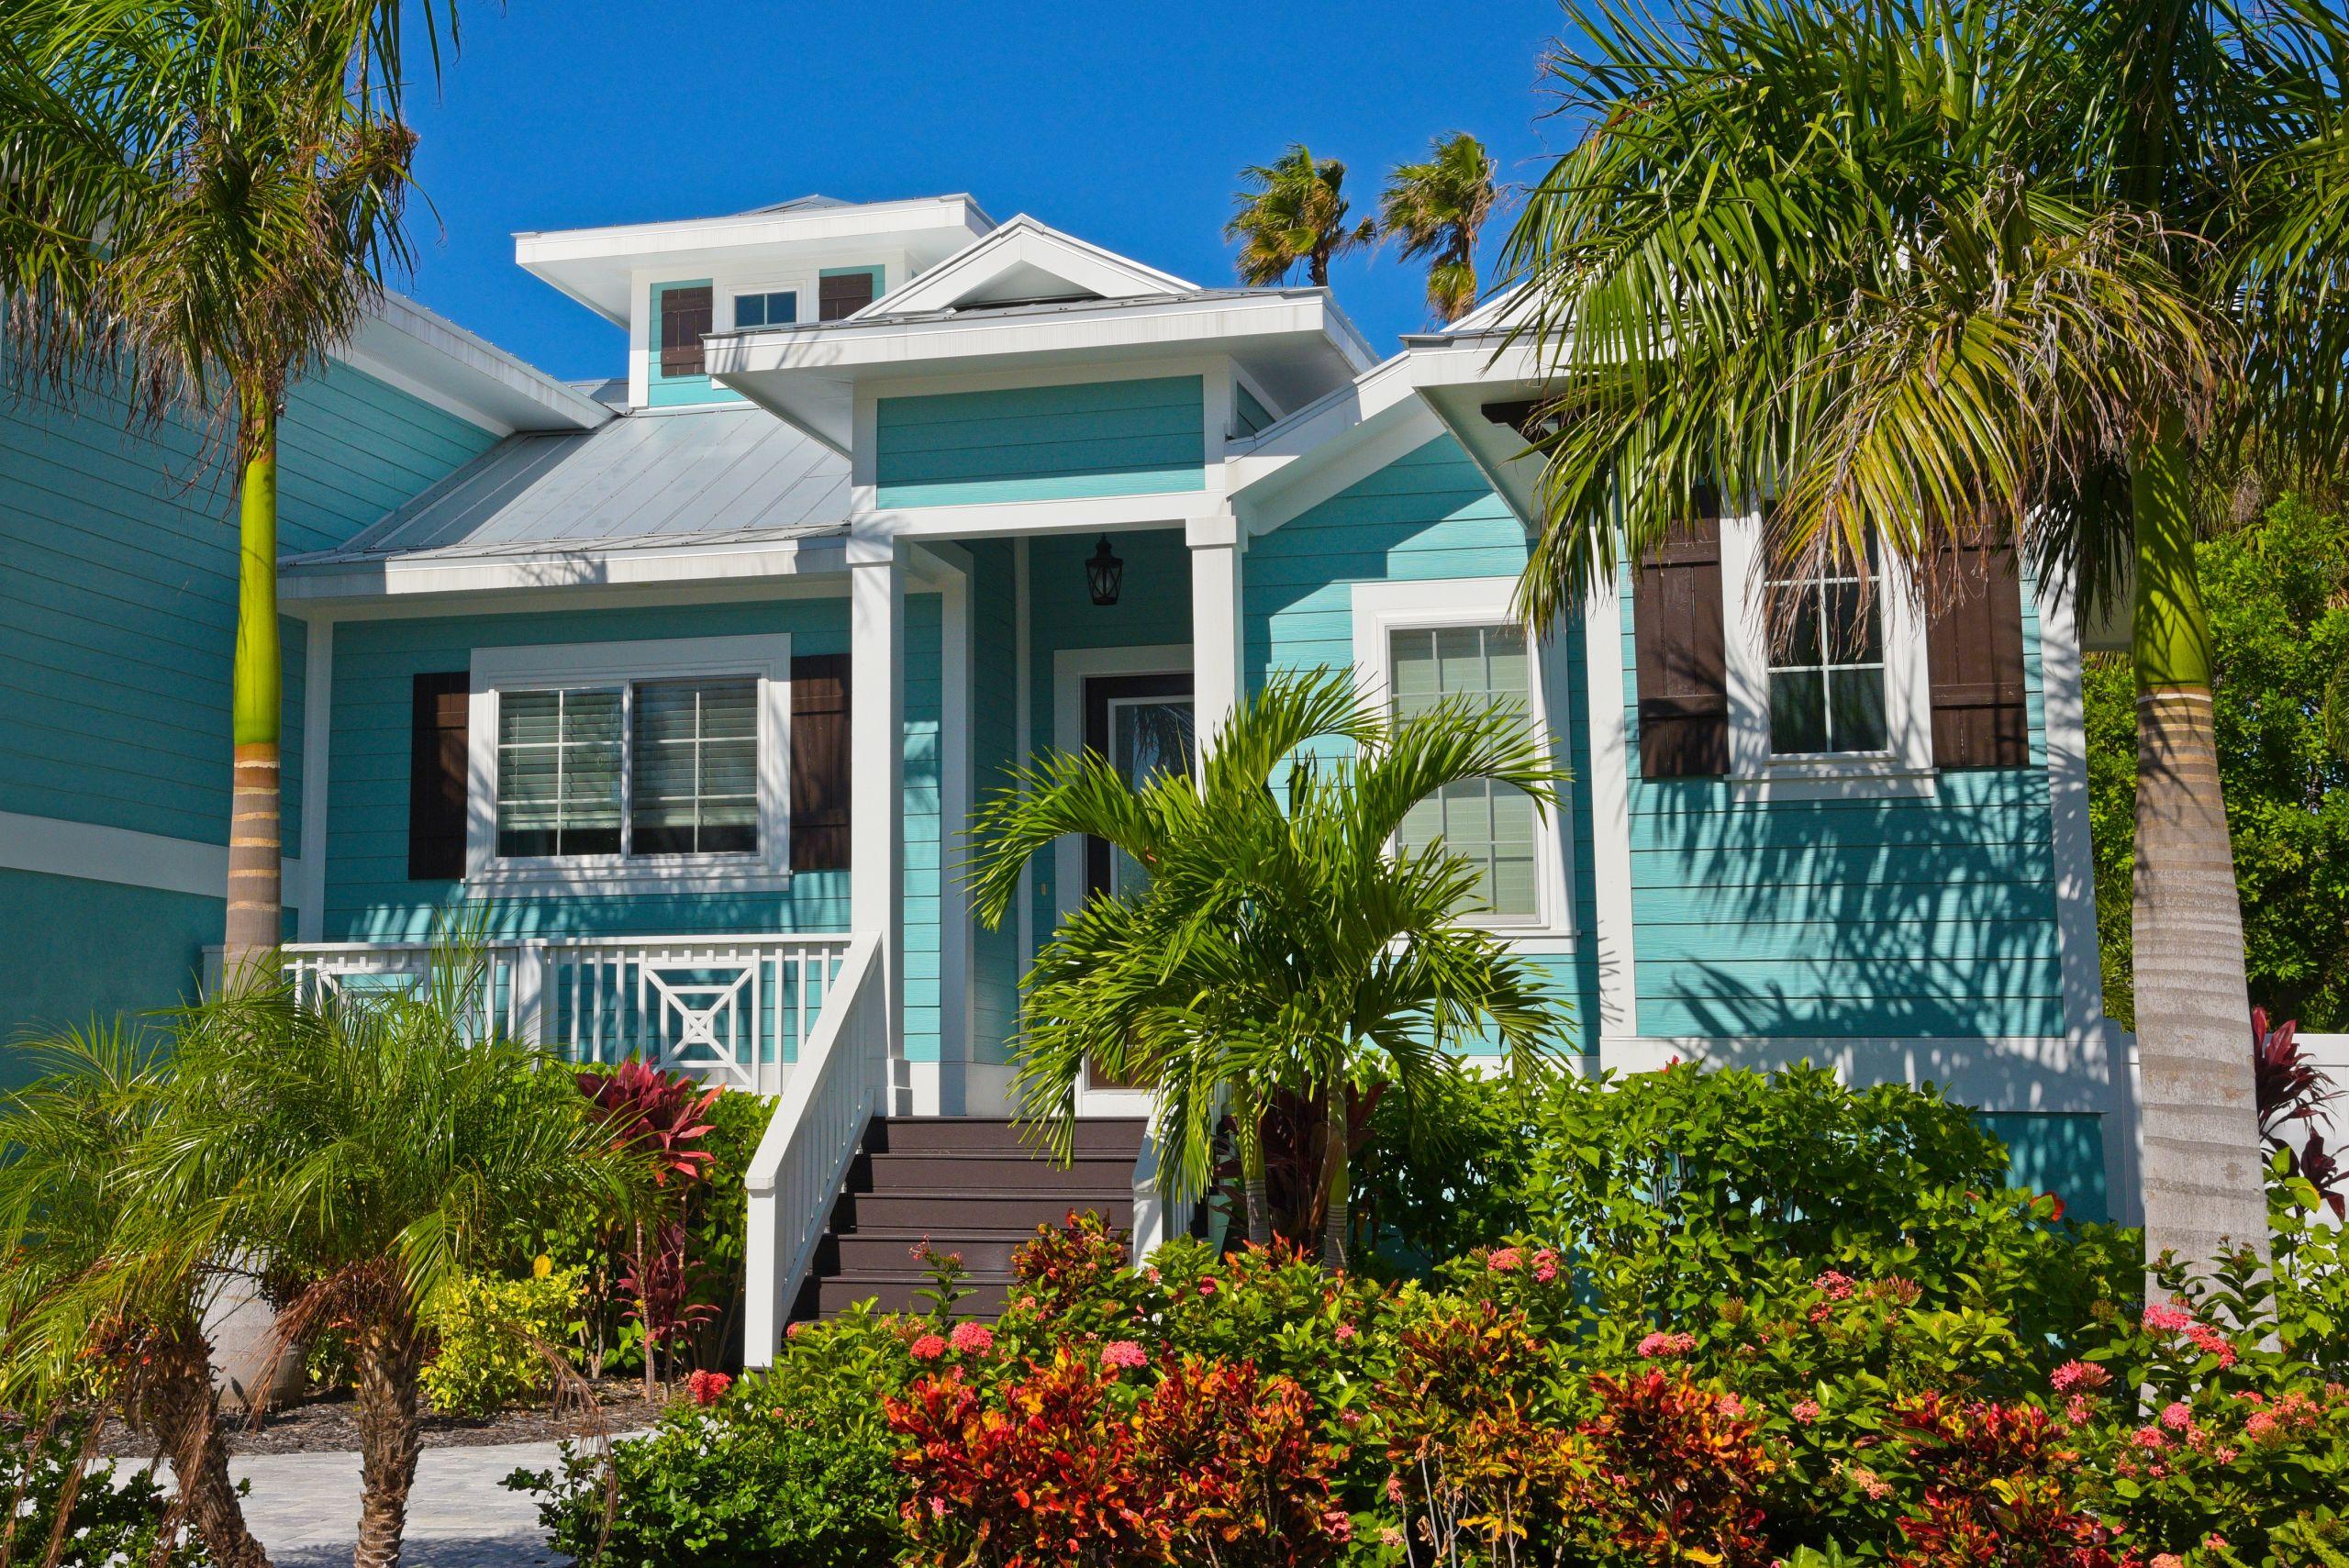 LAKE WORTH - Seashore Shelli - Real Florida Living